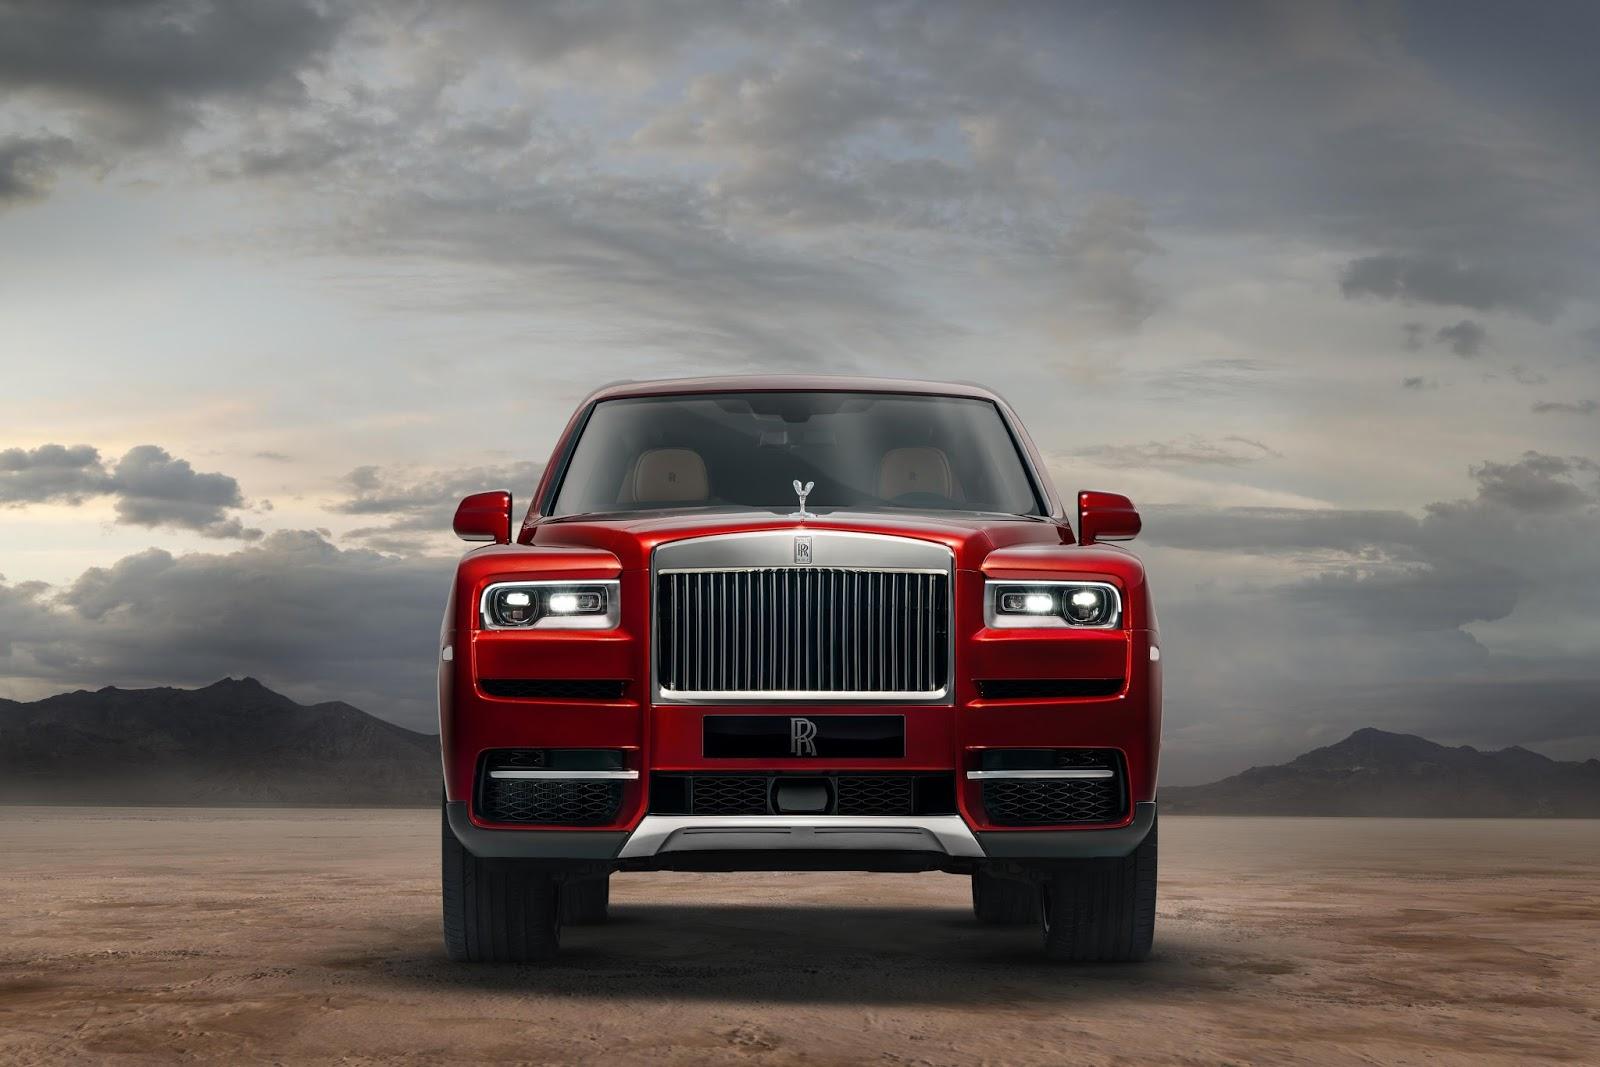 Rolls Royce Cullinan Suv Unveiled To Take On Bentley Bentayga